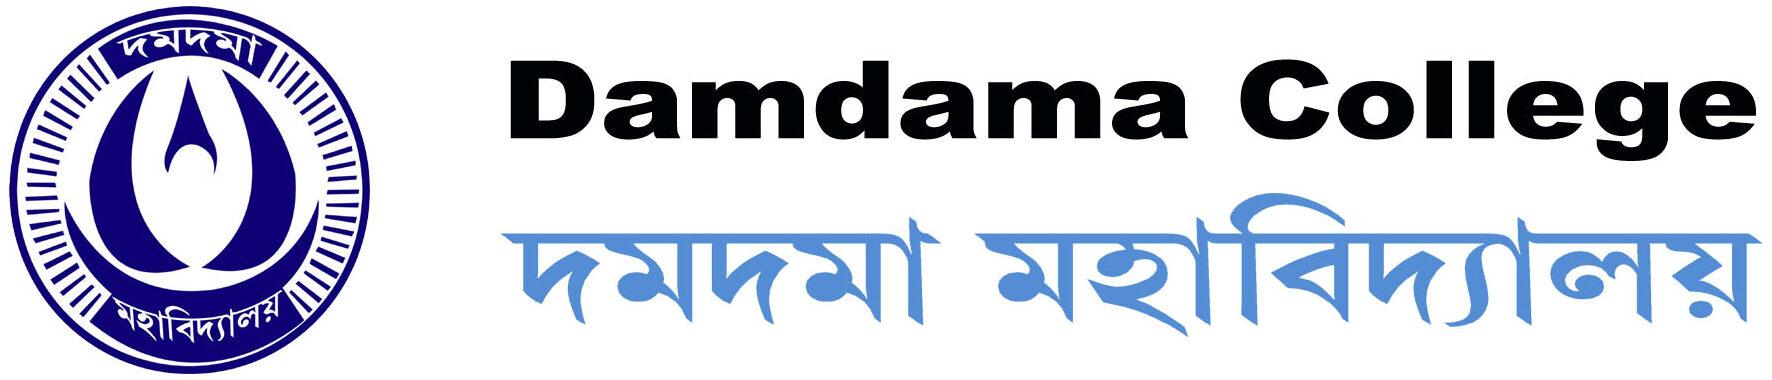 Damdama College